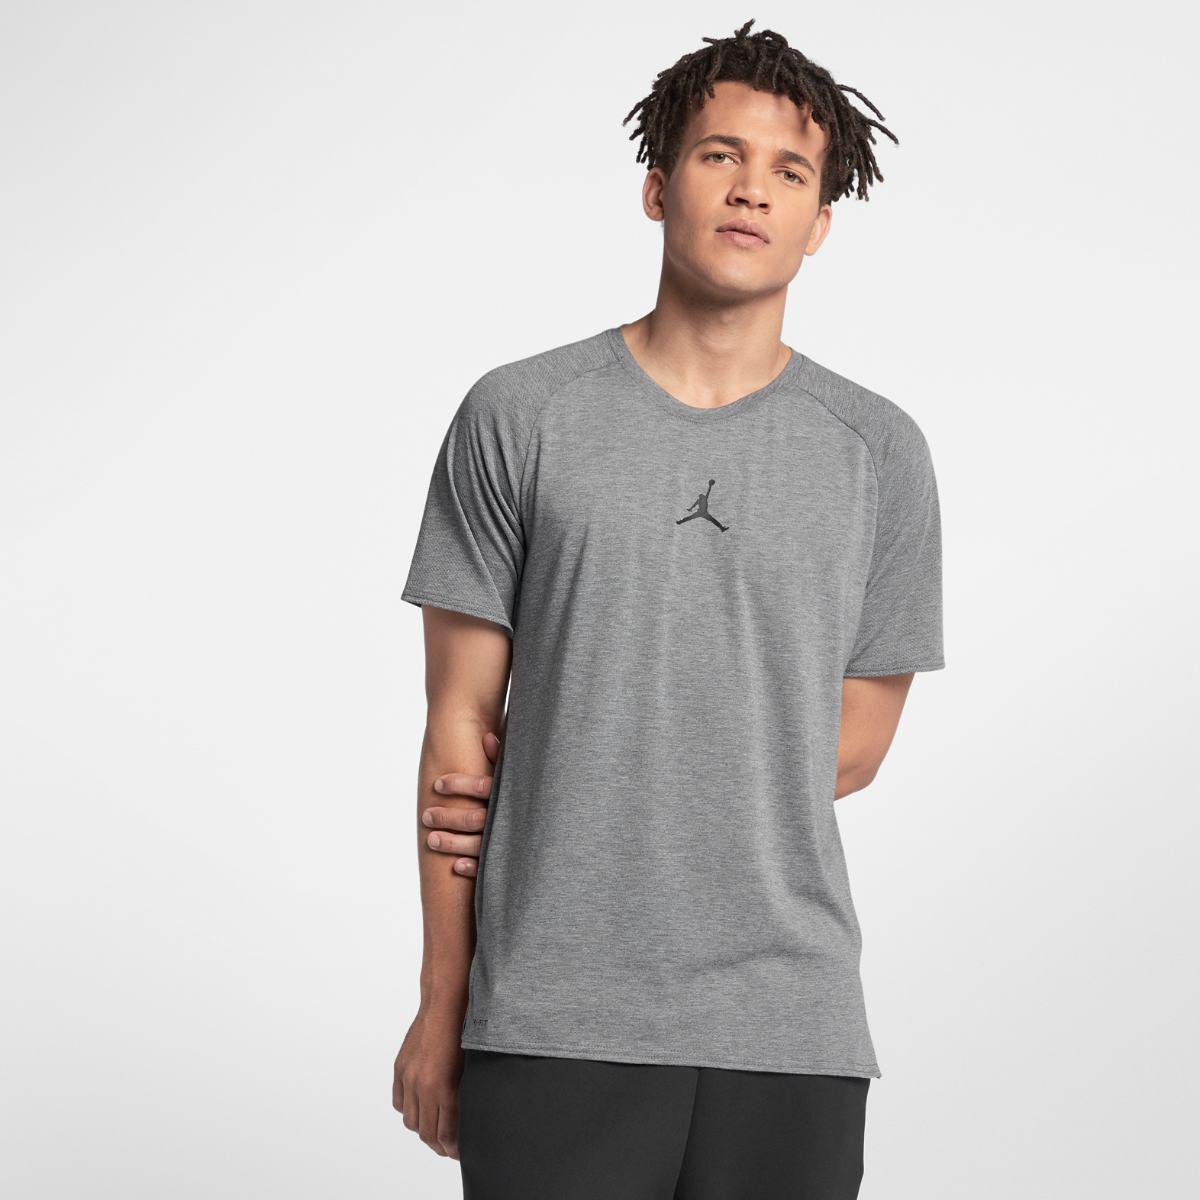 5cd29a24 Купить Мужская футболка NIKE 23 Alpha Dry Top (Артикул: 889713-091 ...